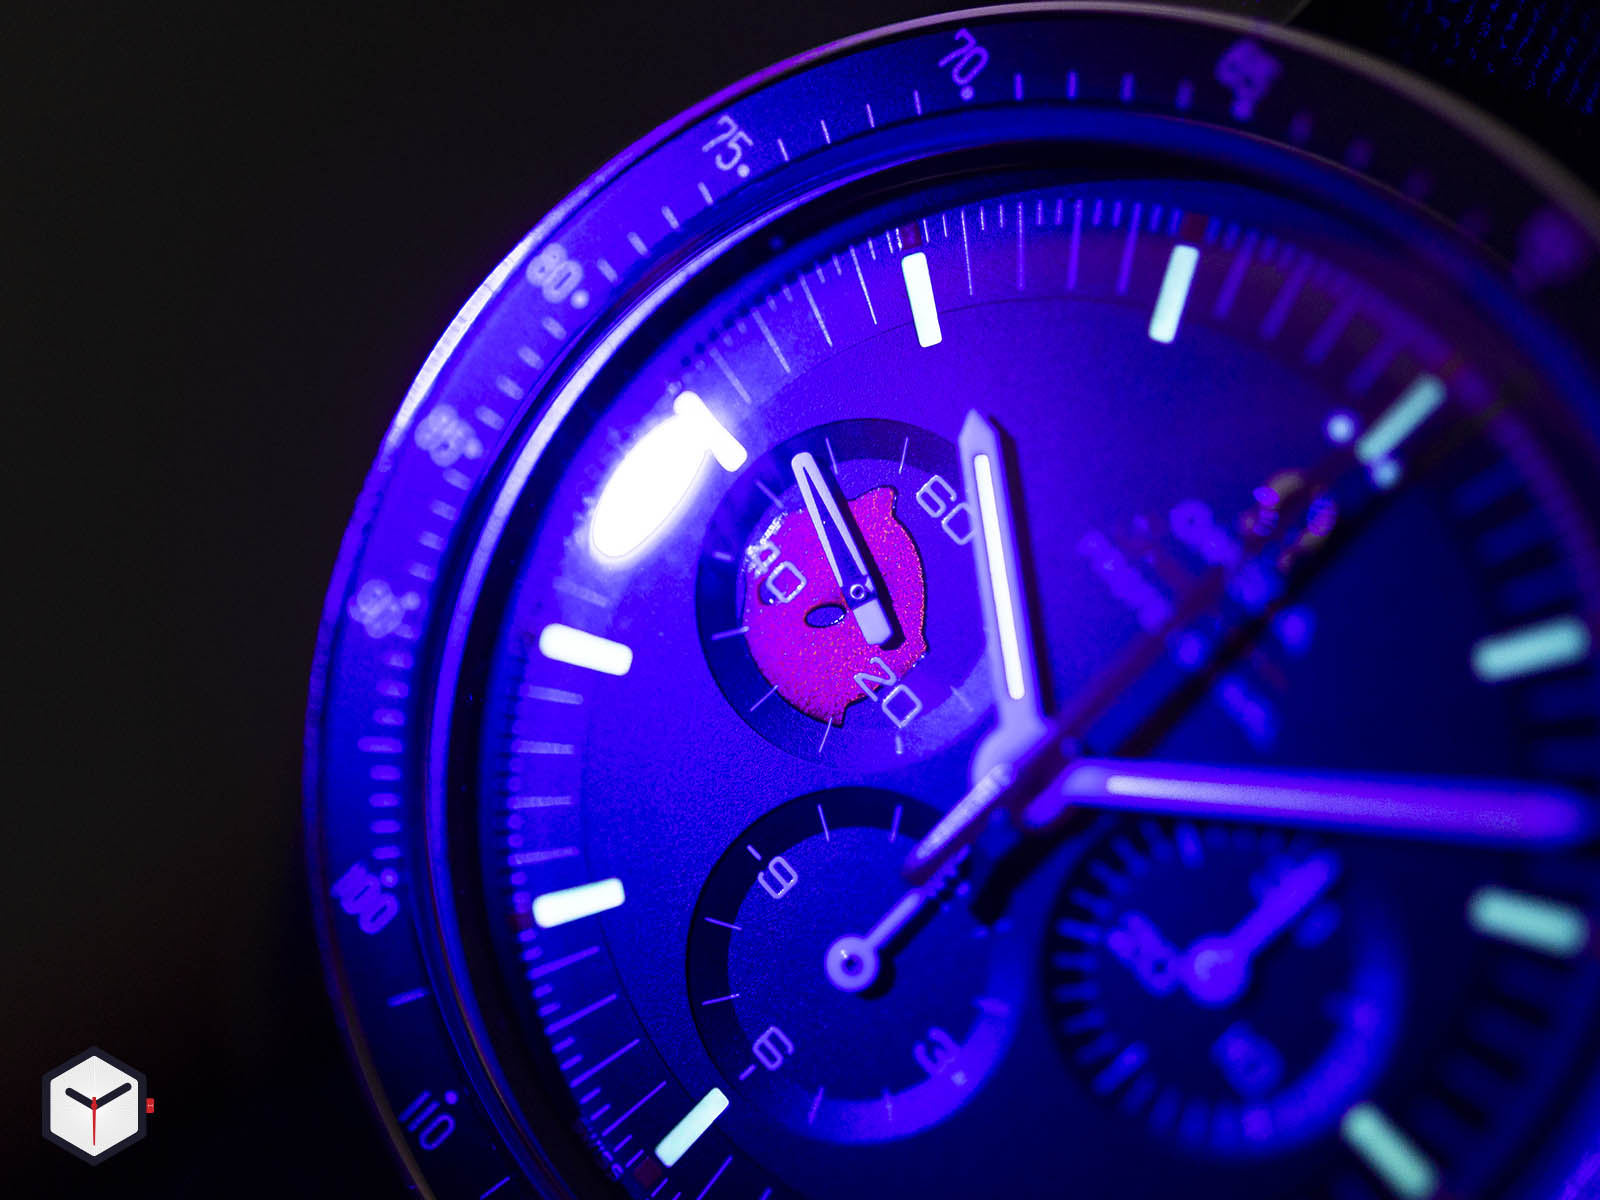 311-12-42-30-01-001-omega-speedmaster-speedy-tuesday-2018-edition-ultraman-8.jpg